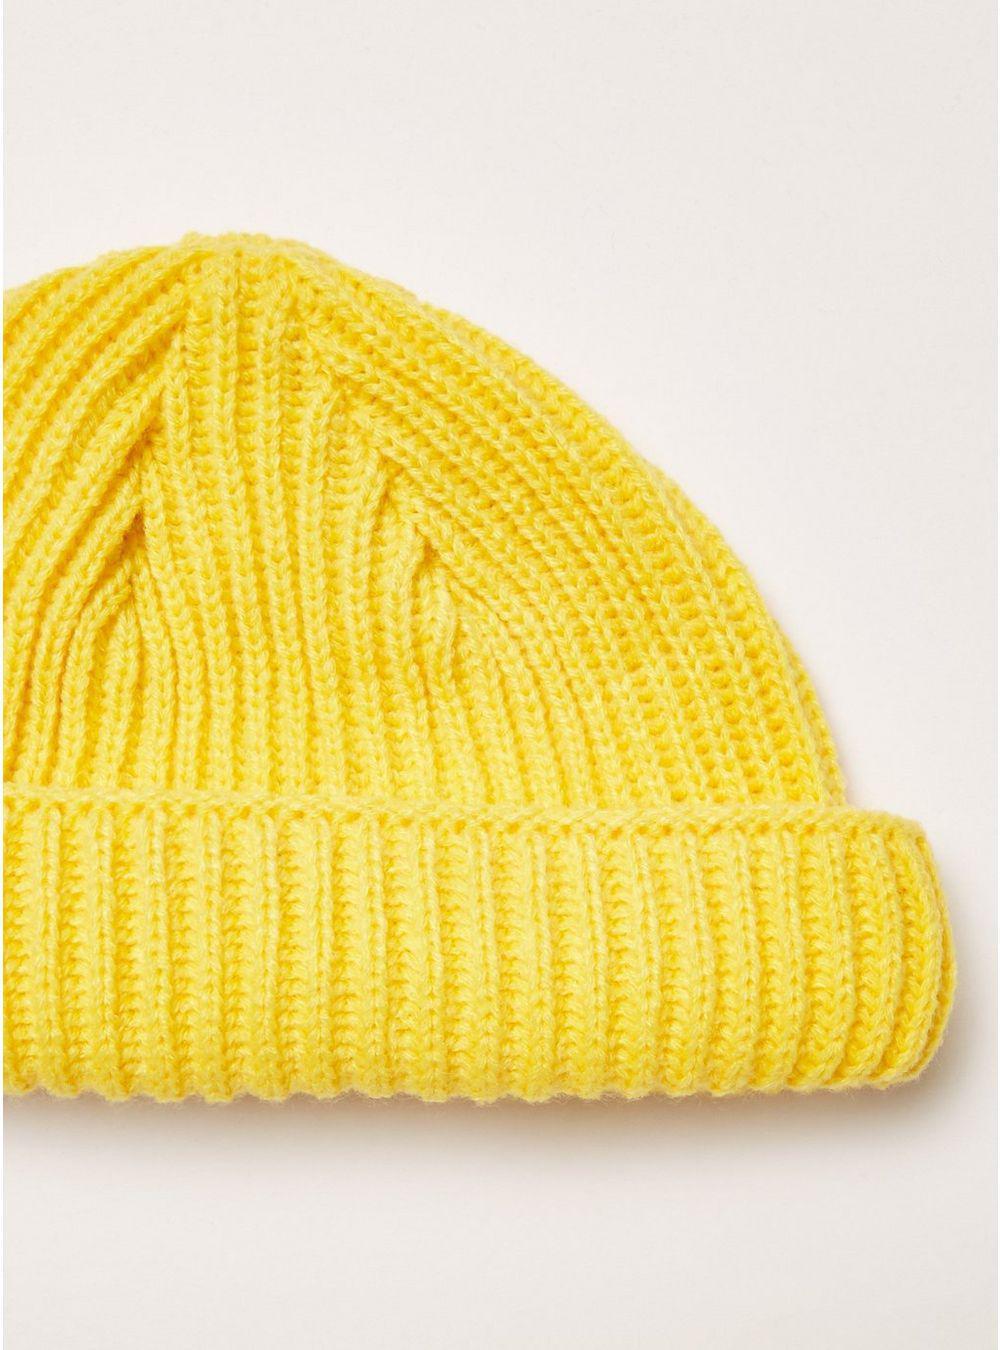 c62fc56bf80 TOPMAN Yellow Ribbed Docker Beanie in Yellow for Men - Lyst